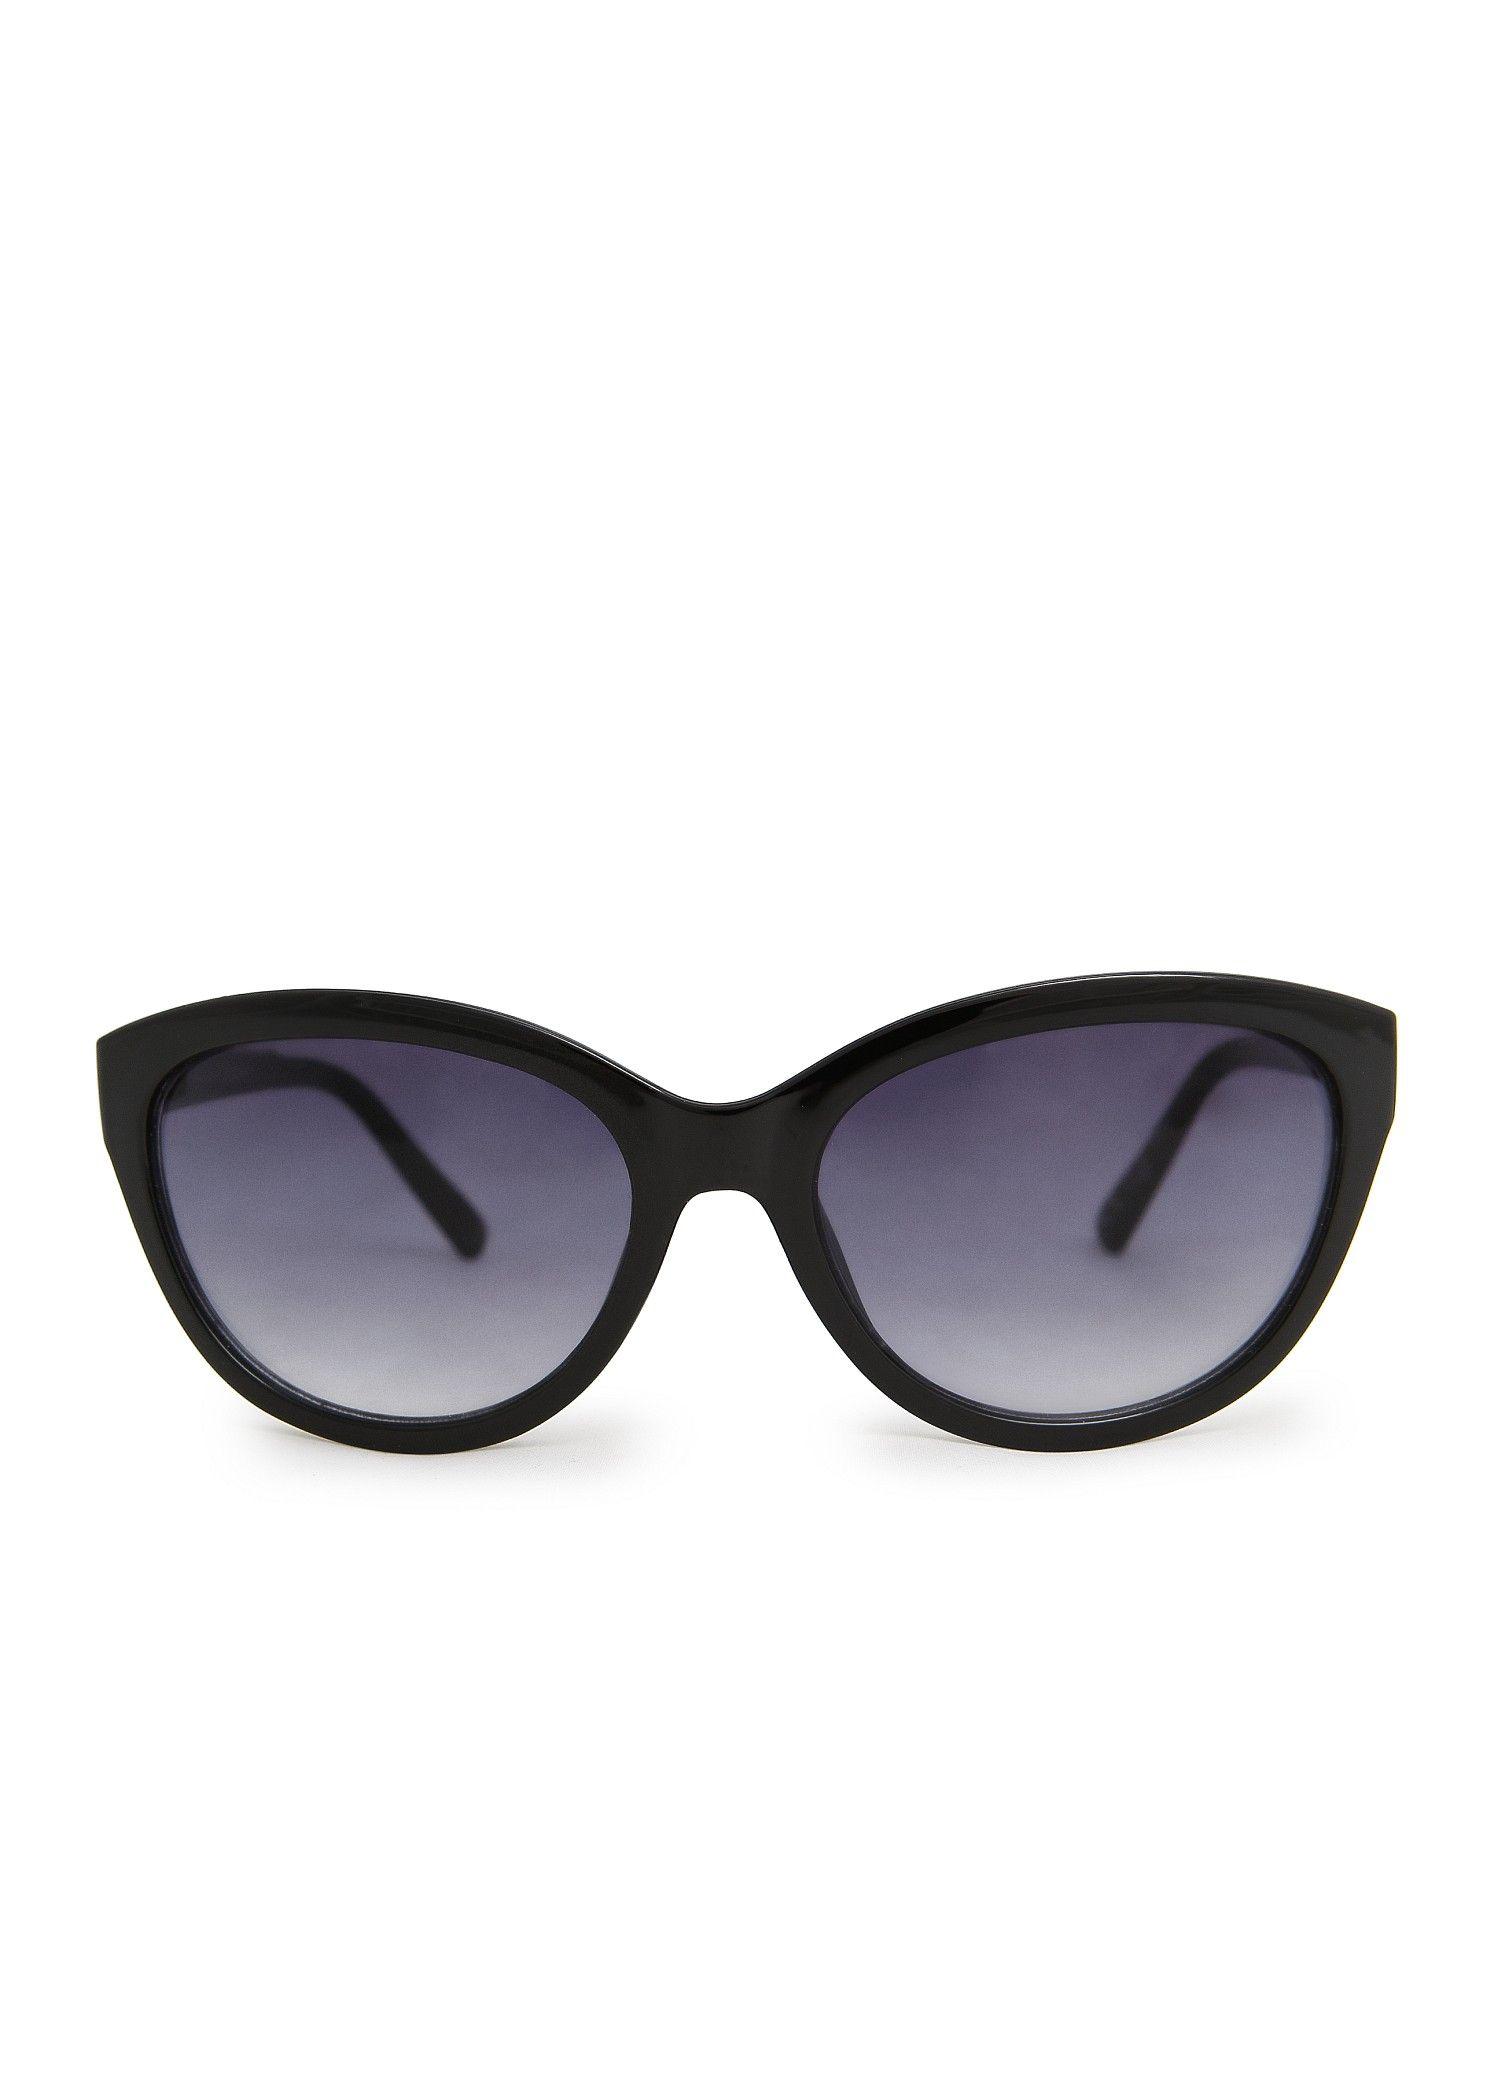 aec54141a4 Studded cat-eye sunglasses - Women | Accessorise All Areas | Gafas ...